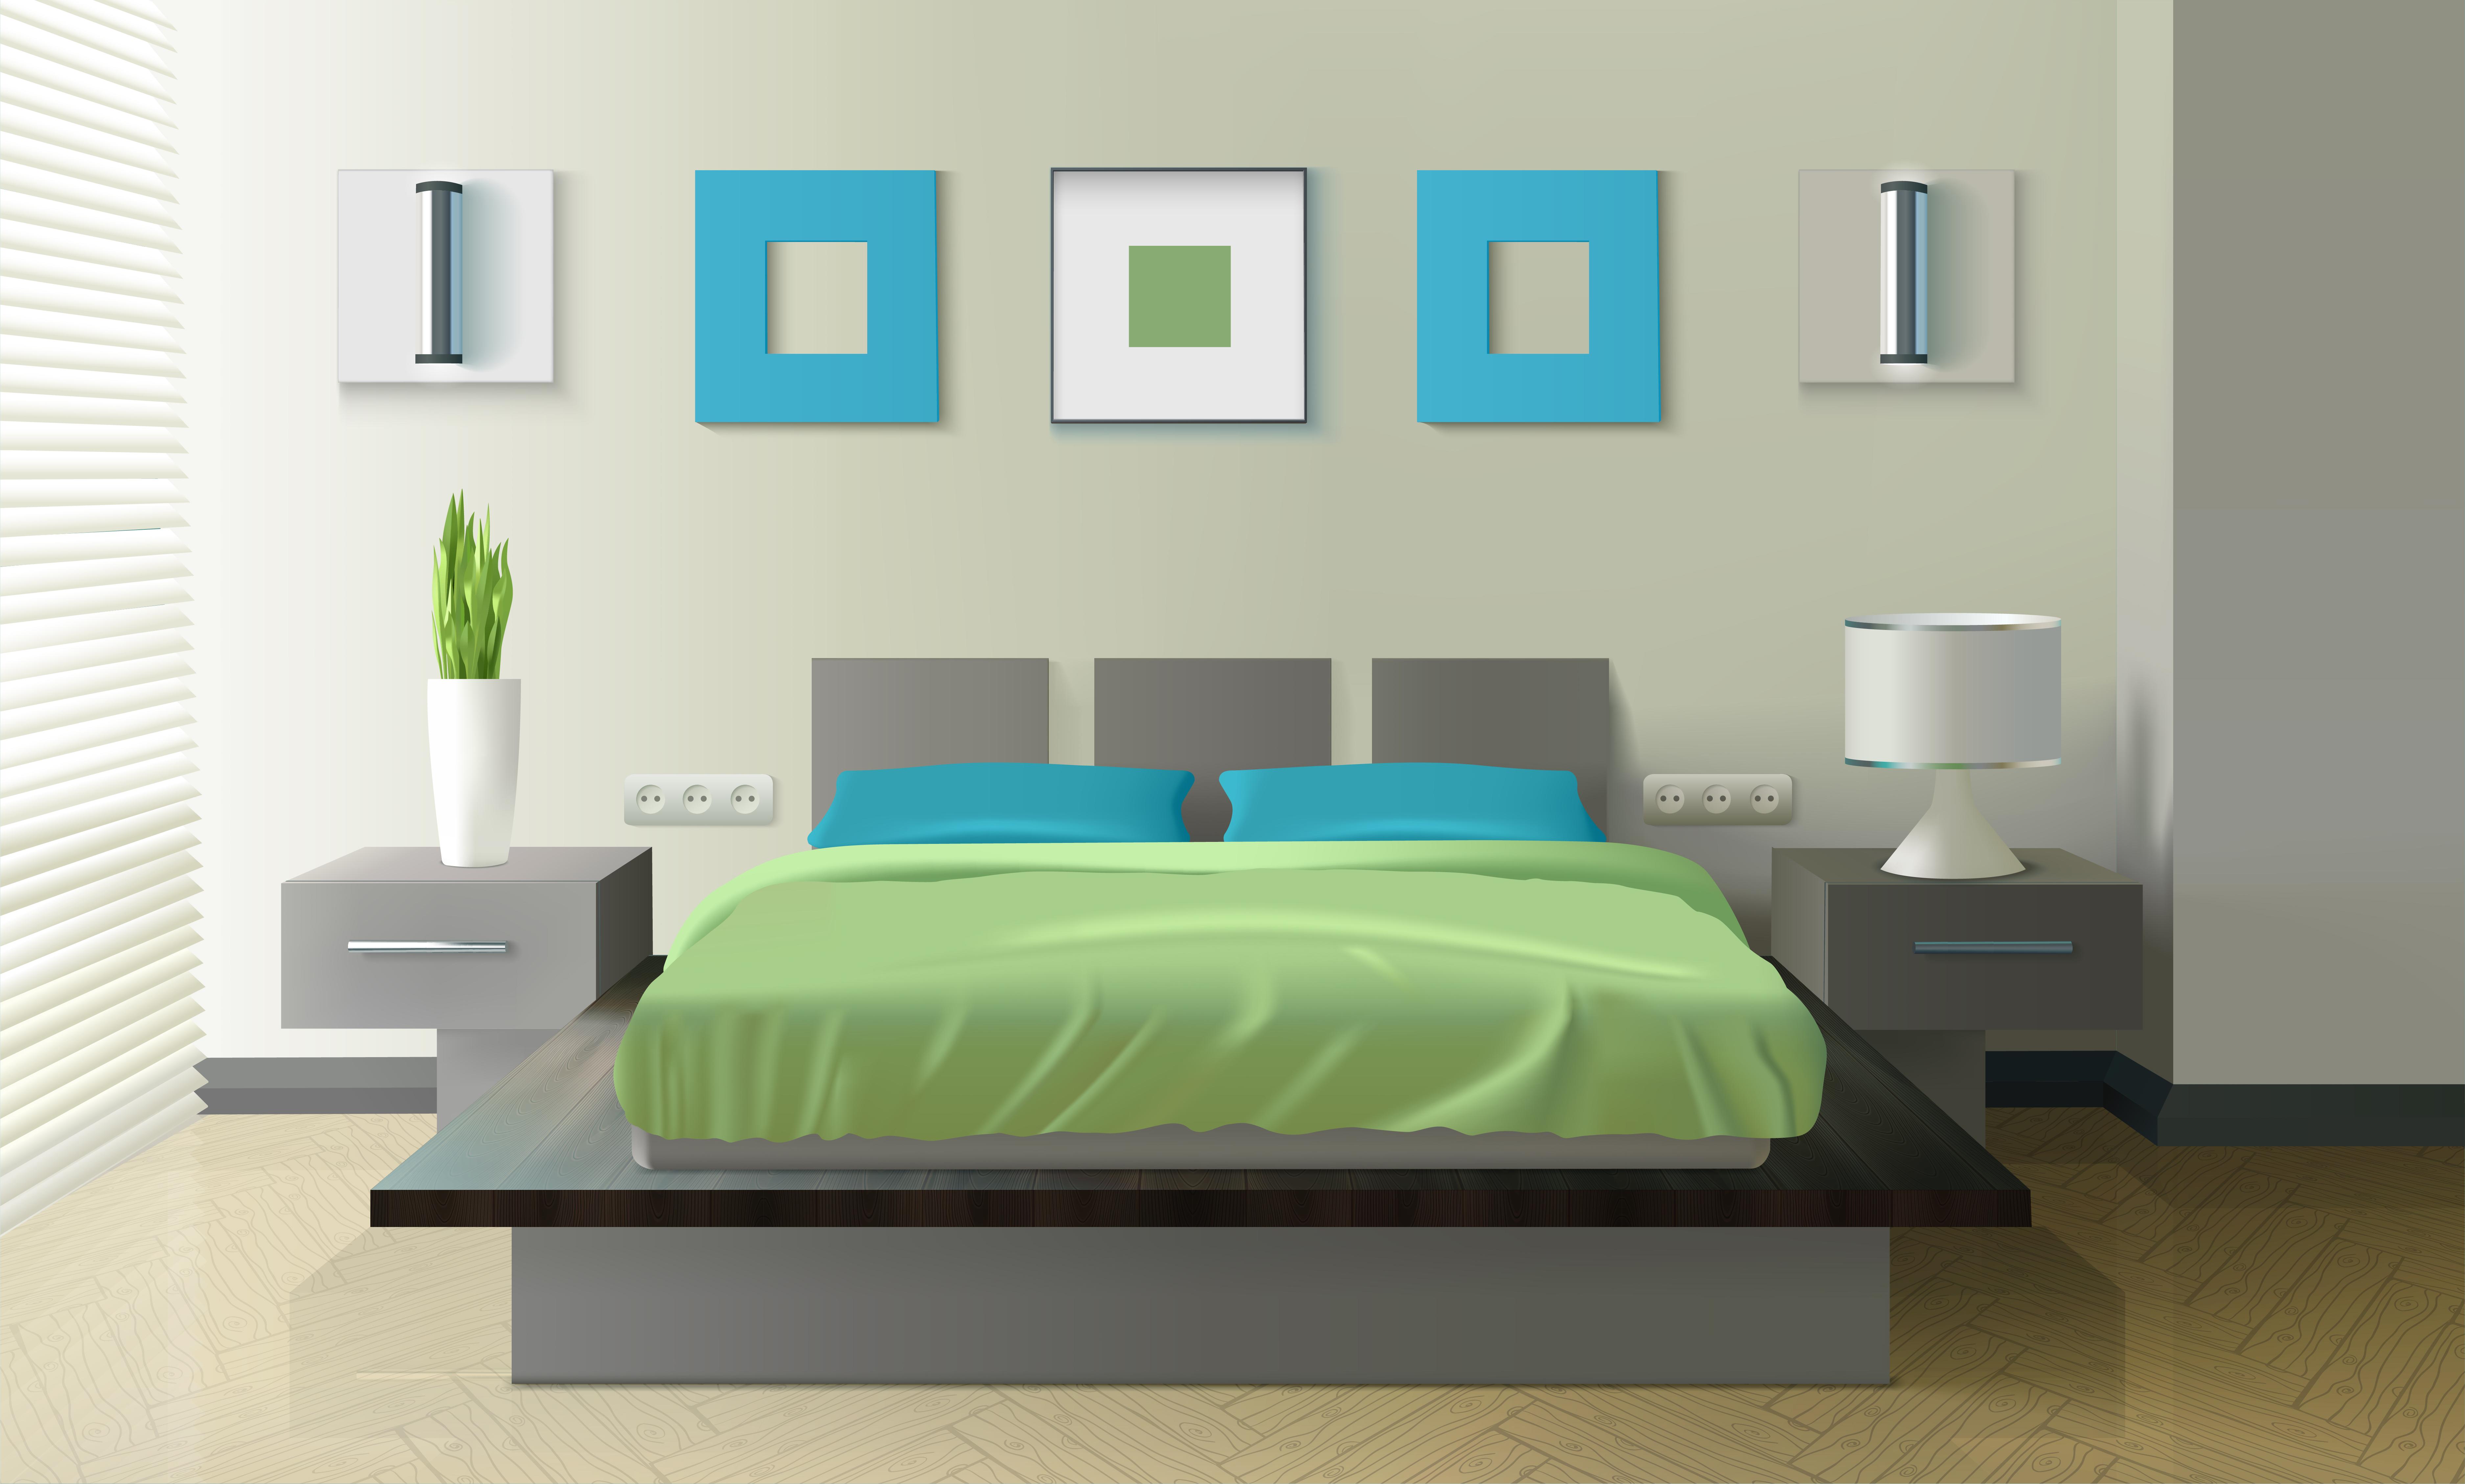 Modern Bedroom Realistic Design - Download Free Vectors, Clipart